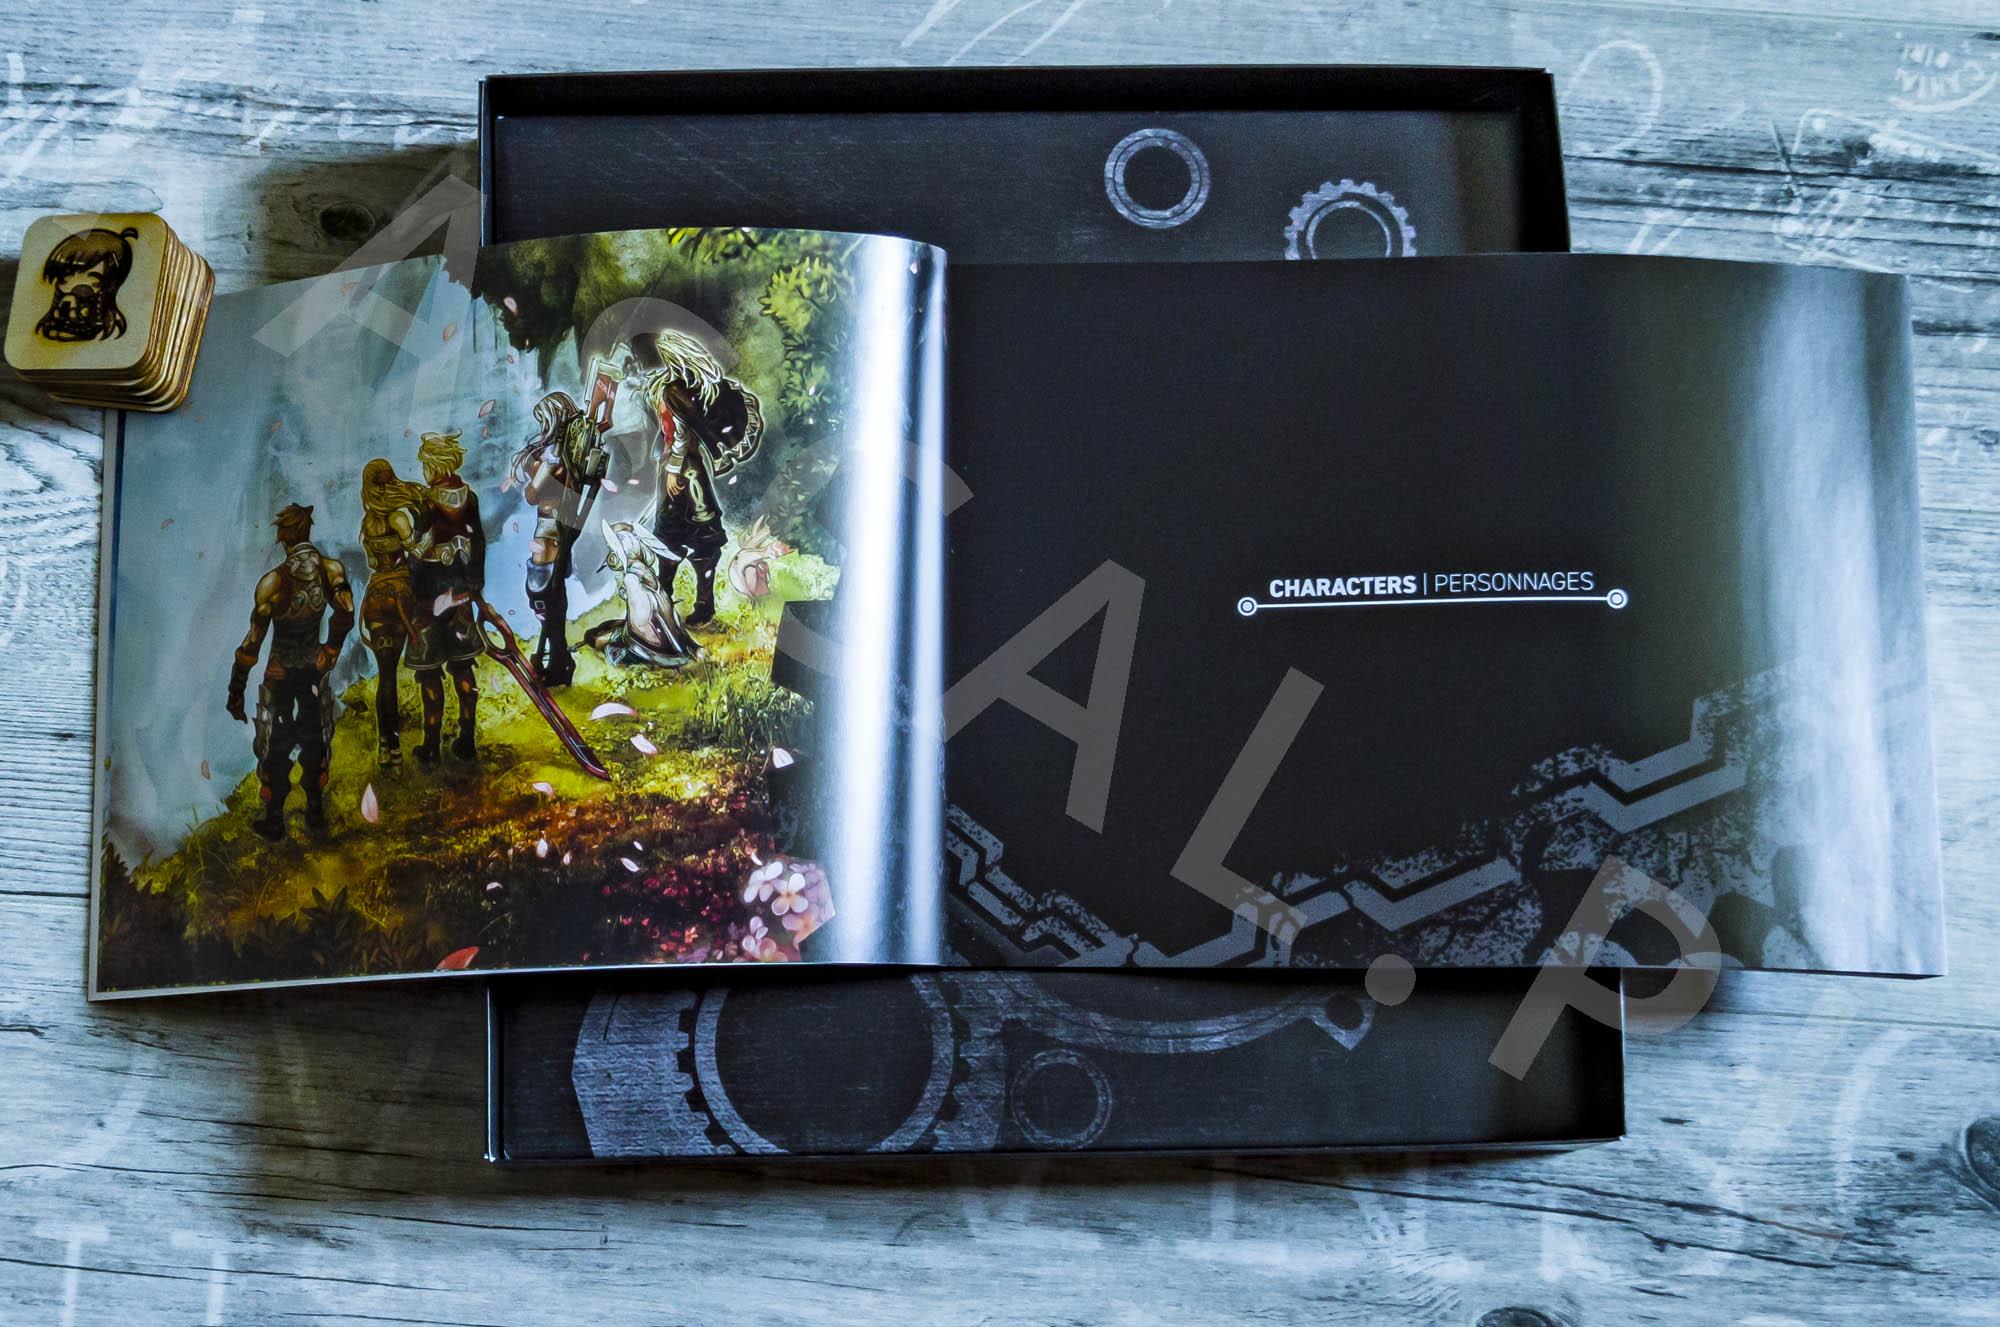 Xenoblade Chronicles Definitive Edition Collectors Set - Artbook - 02 -